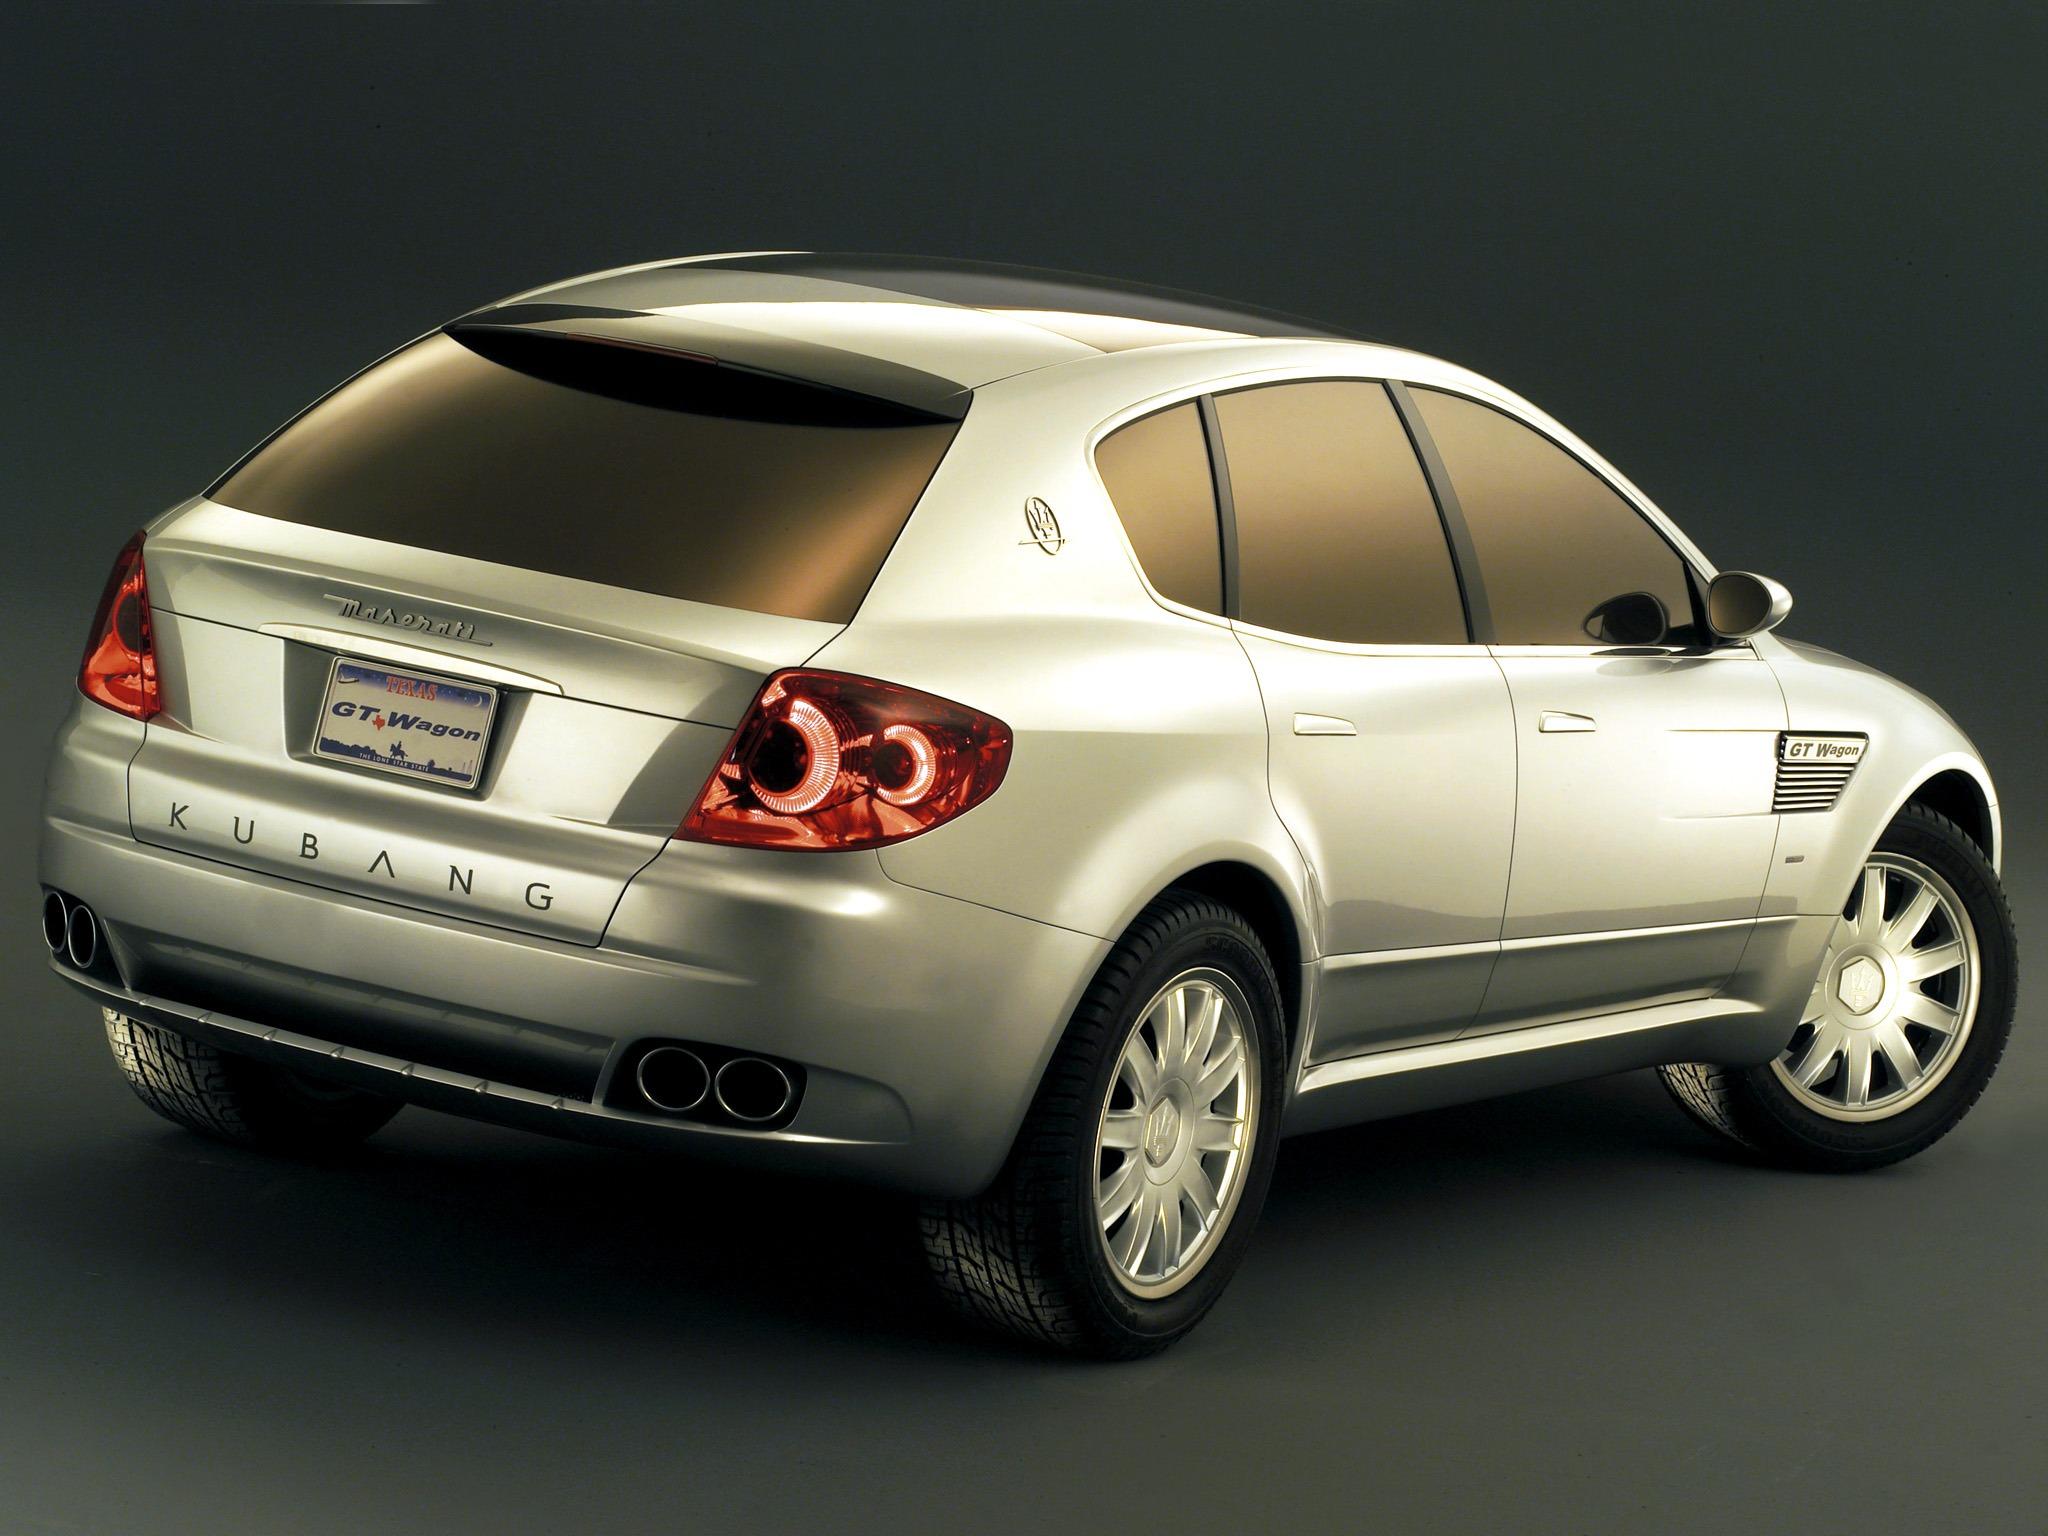 Maserati Kubang Gt Wagon Concept 2003 Old Concept Cars